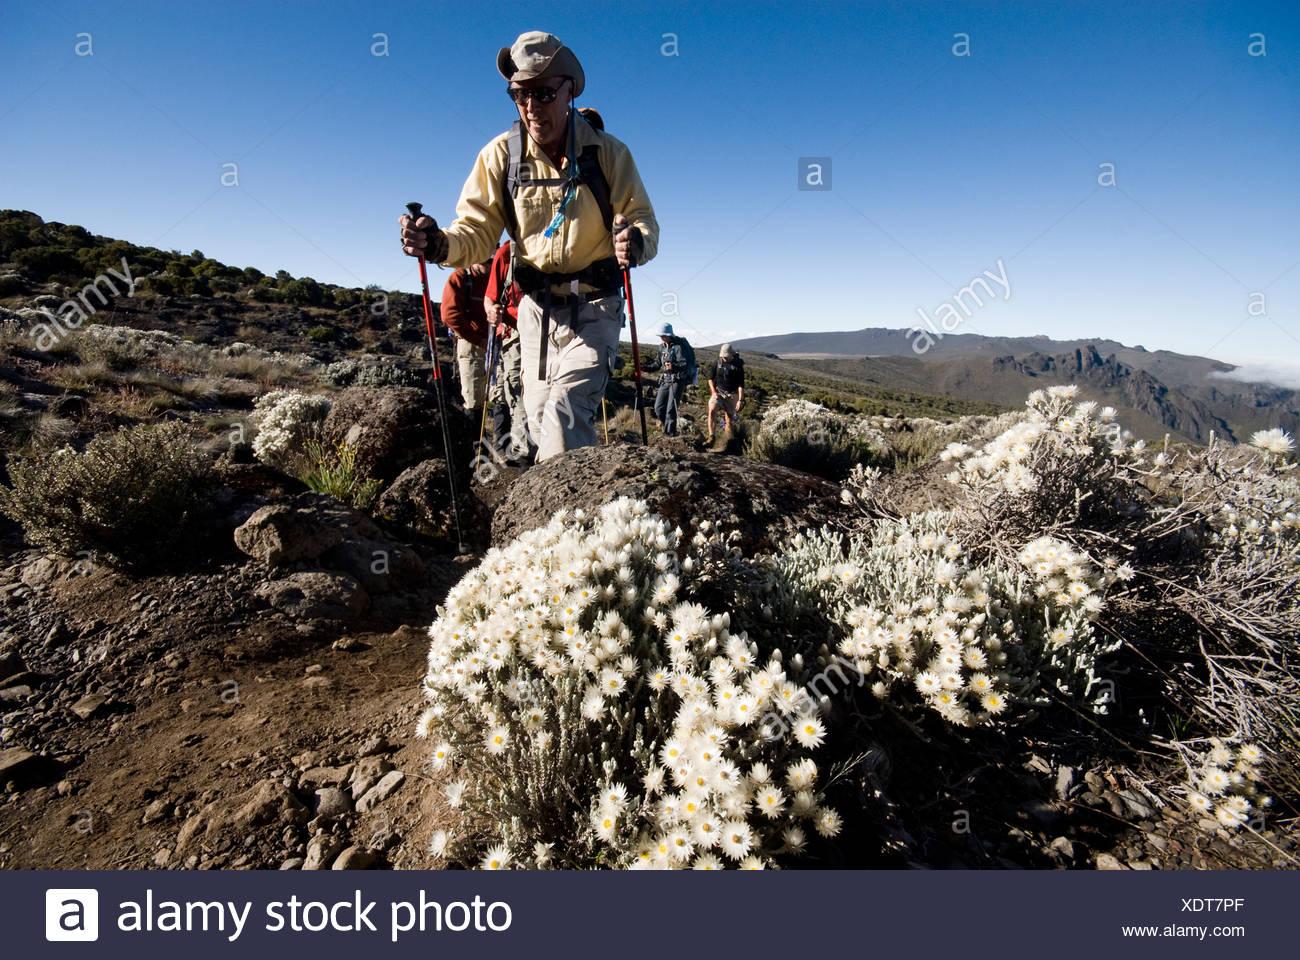 A senior man treks by wild alpine flowers in the high desert below Mt. Kilimanjaro. - Stock Image